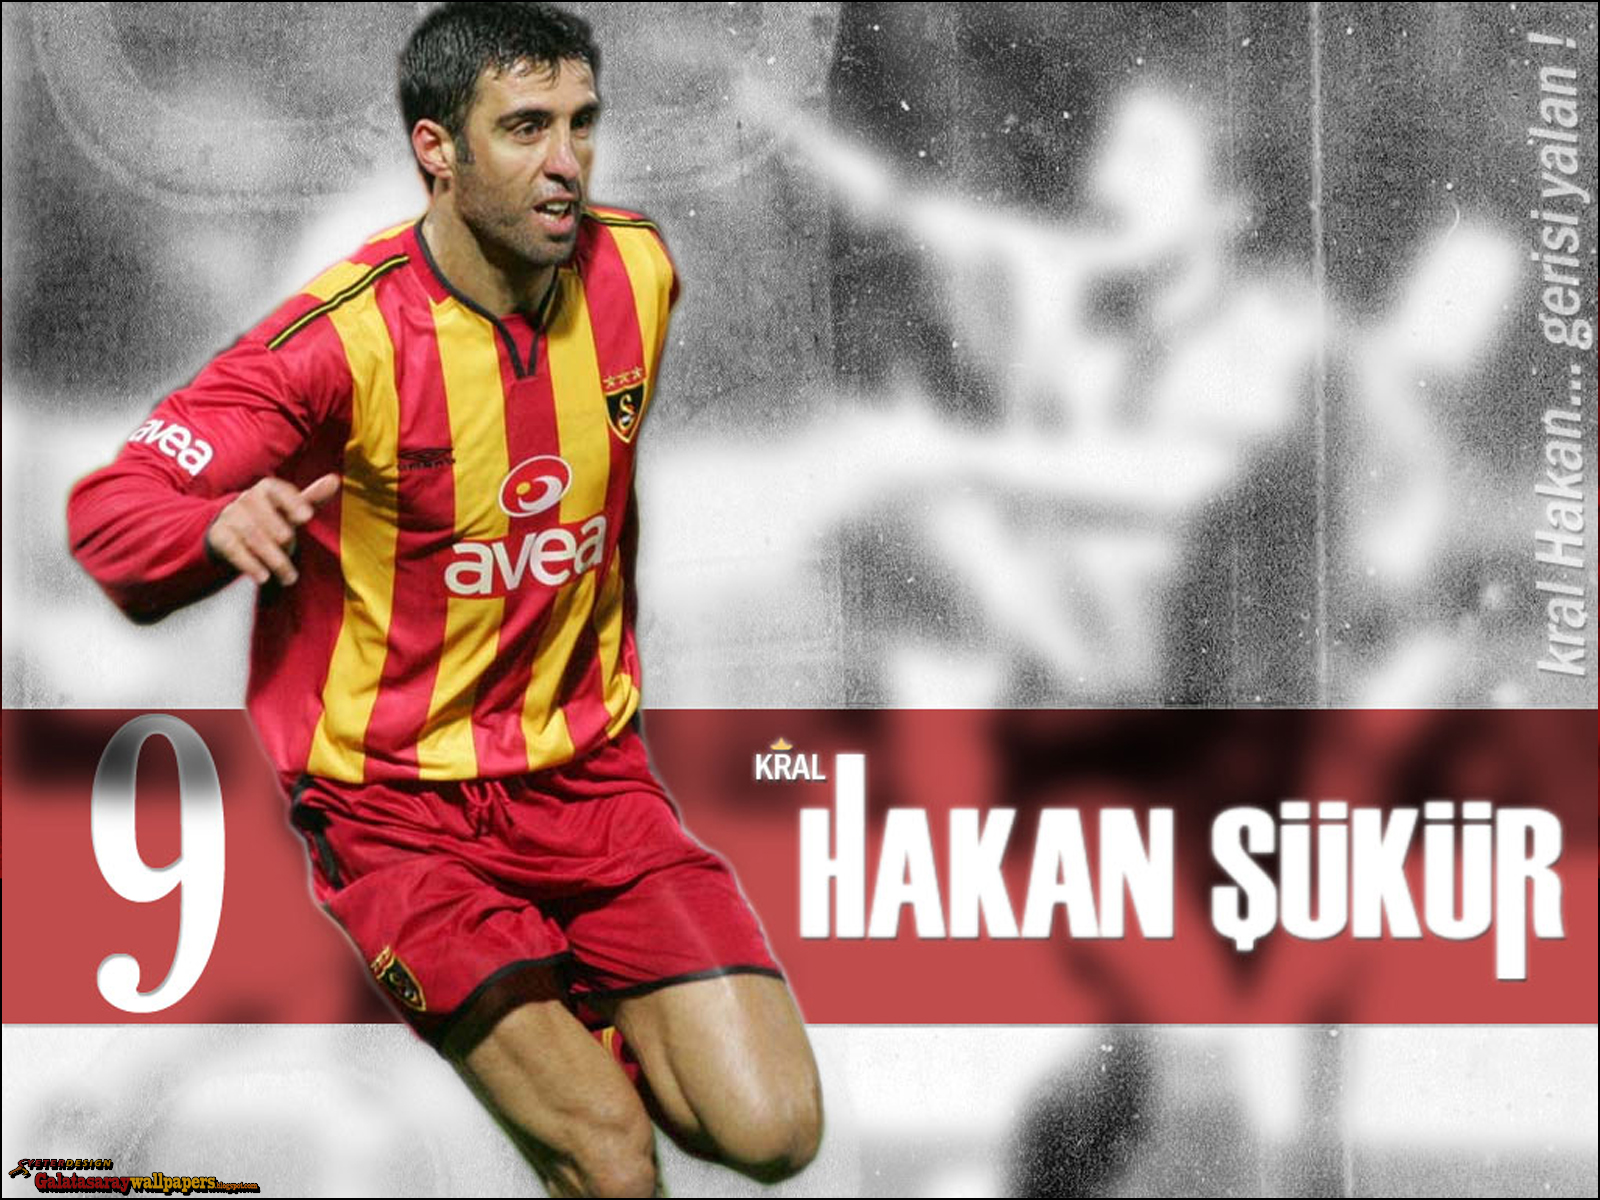 Galatasaray Wallpapers: 'Kral' Hakan Sükür